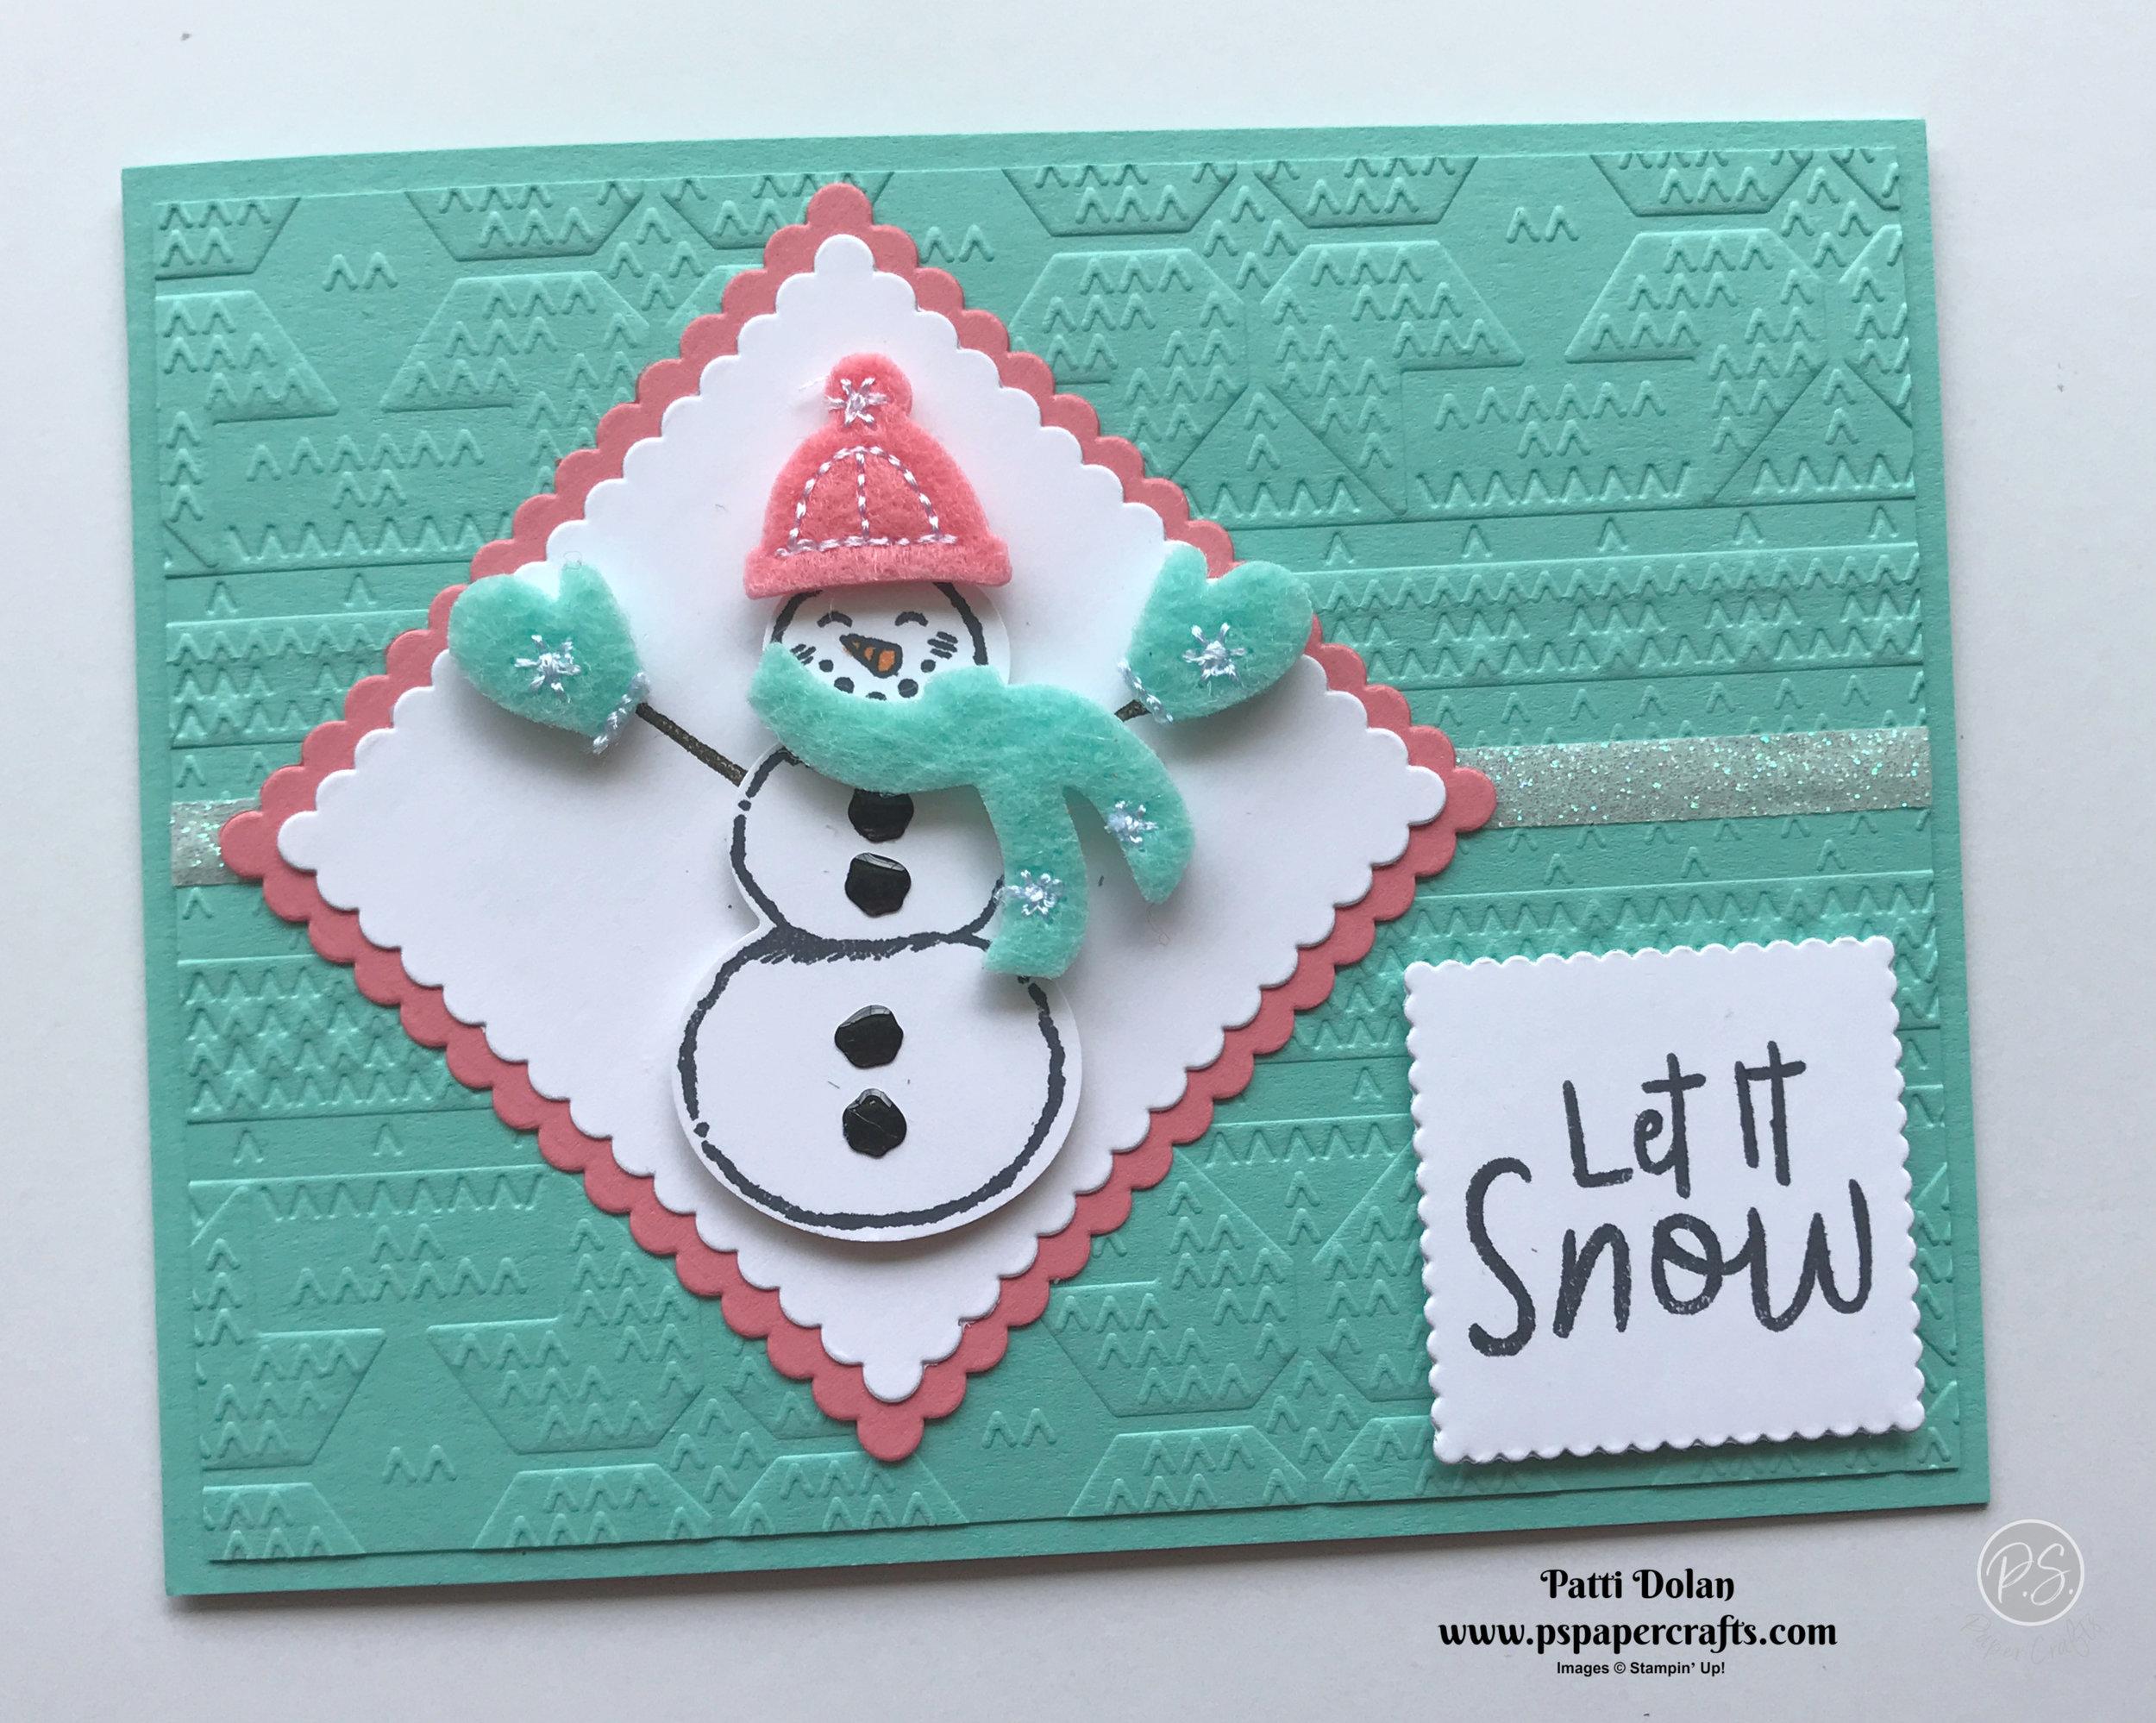 Snowman Season Pink Hat.jpg